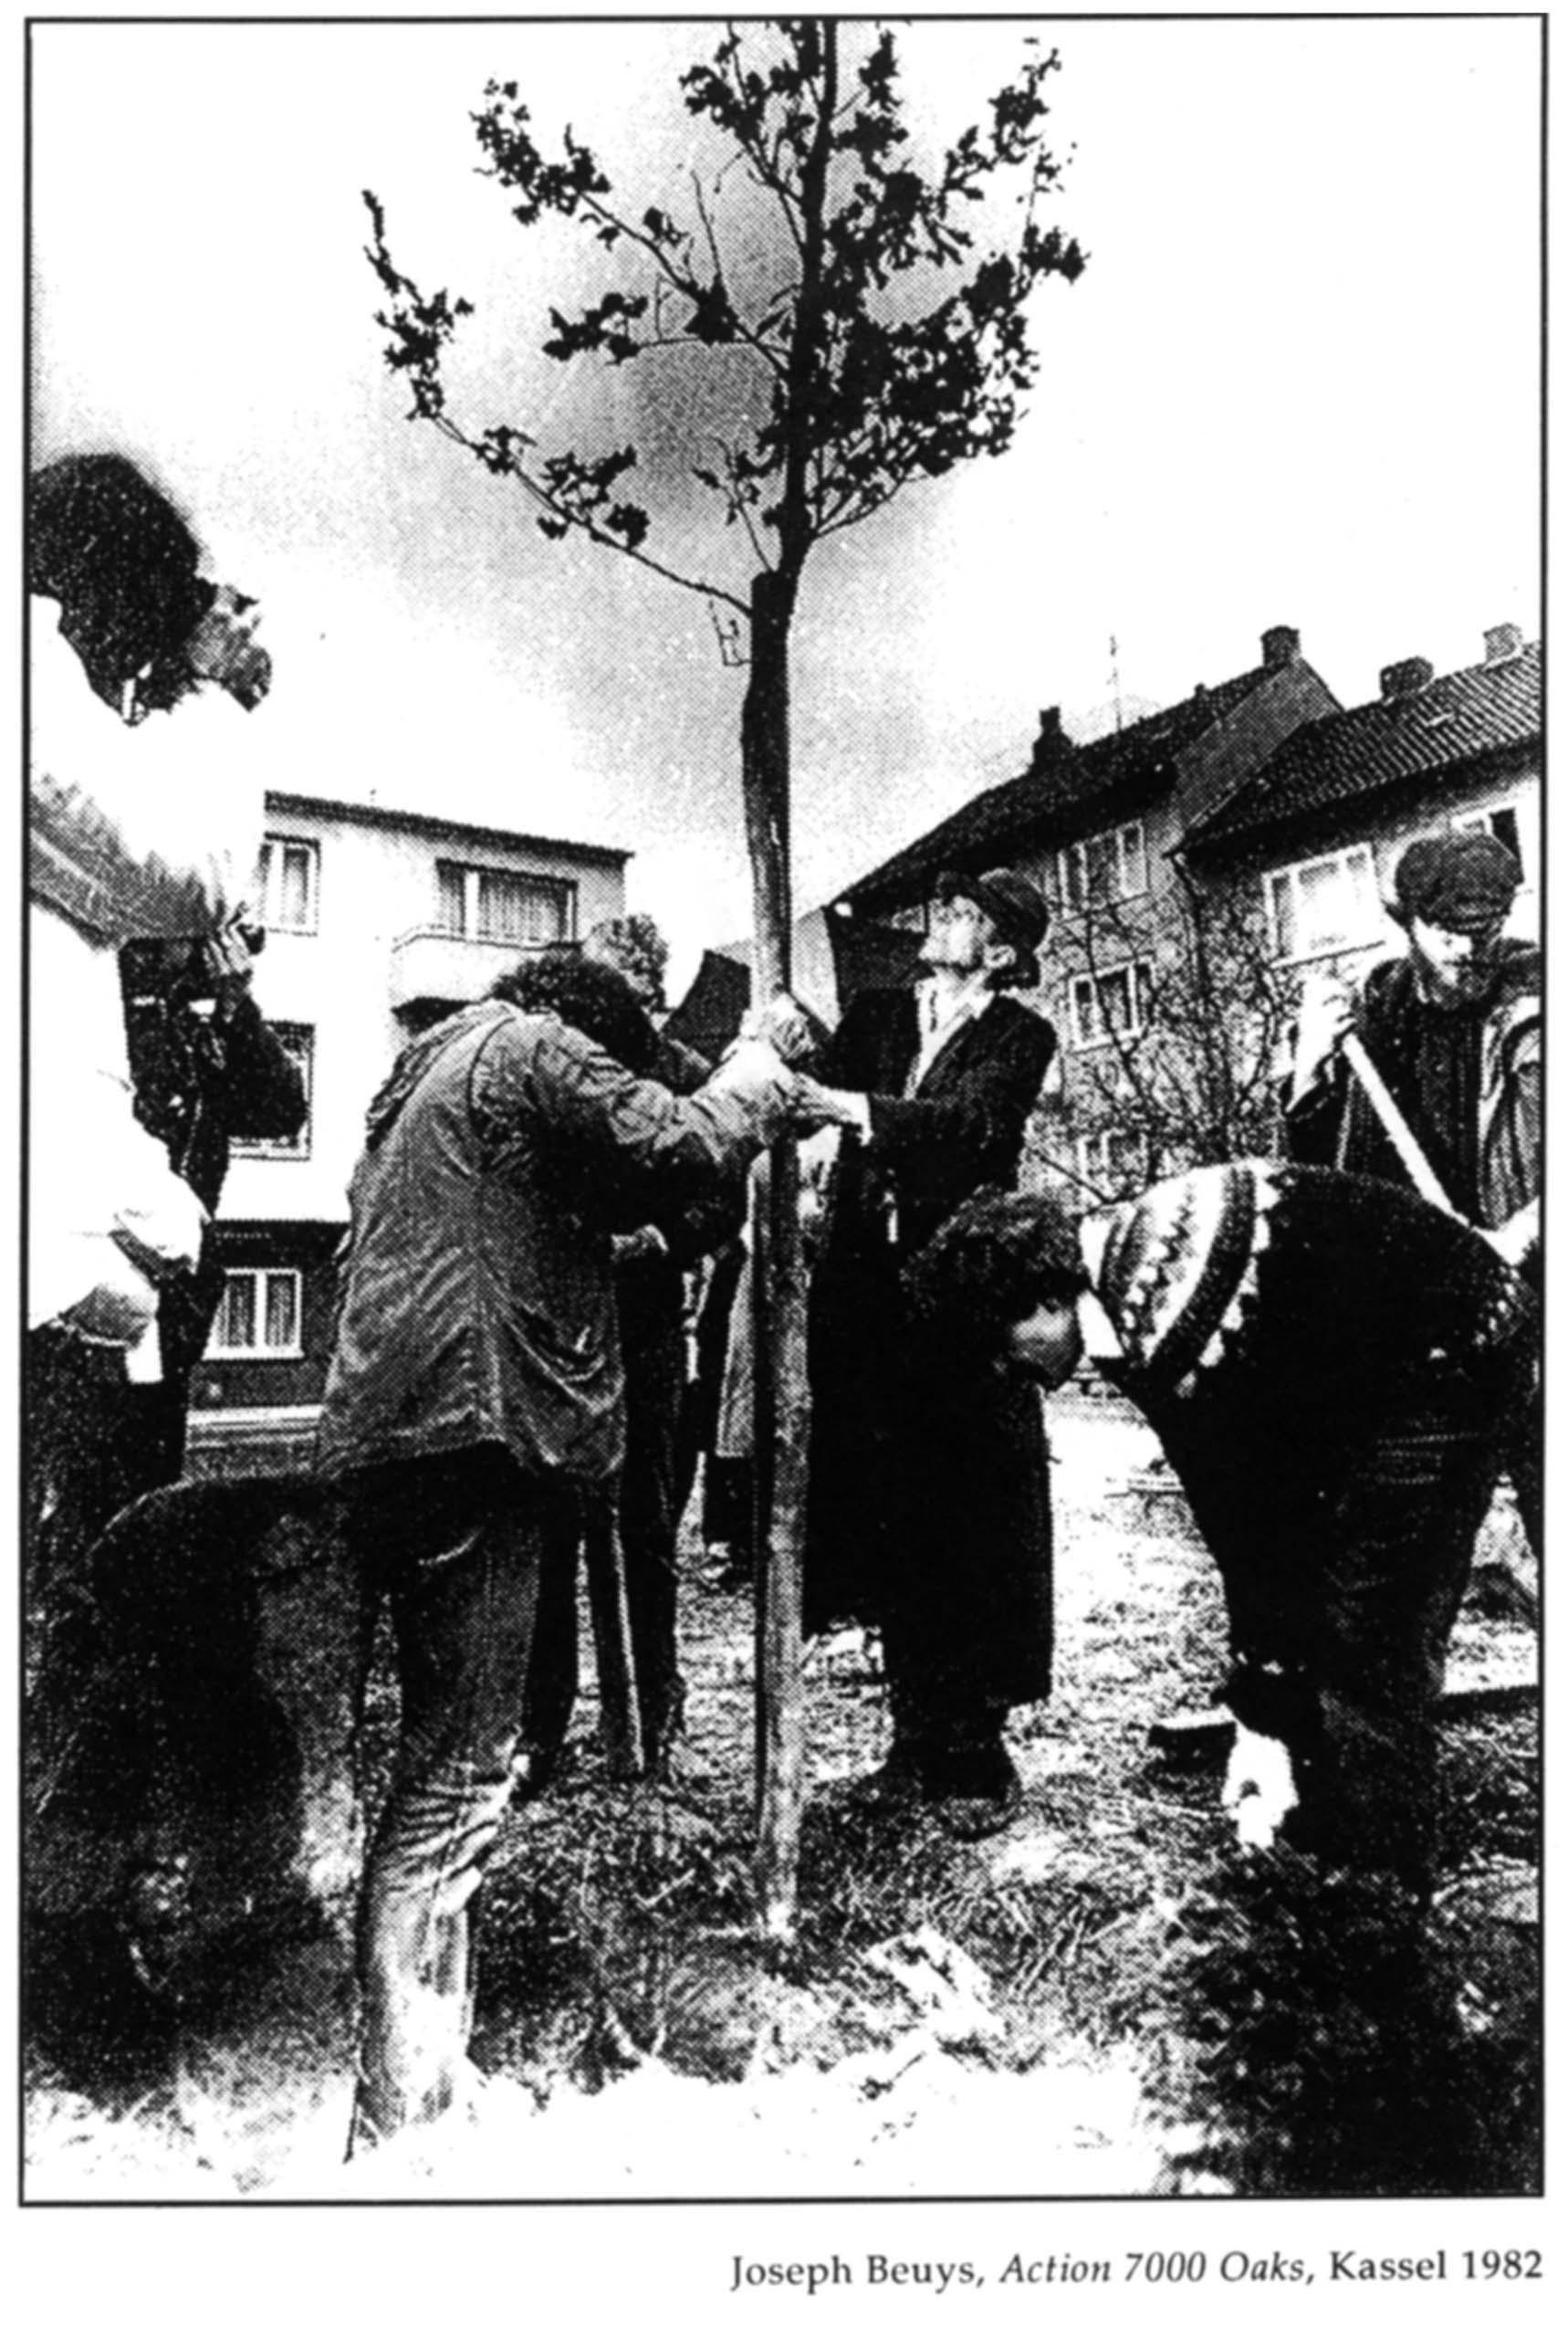 ACTION 7000 OAKS Joseph Beuys  Documenta 7 Kassel 1982